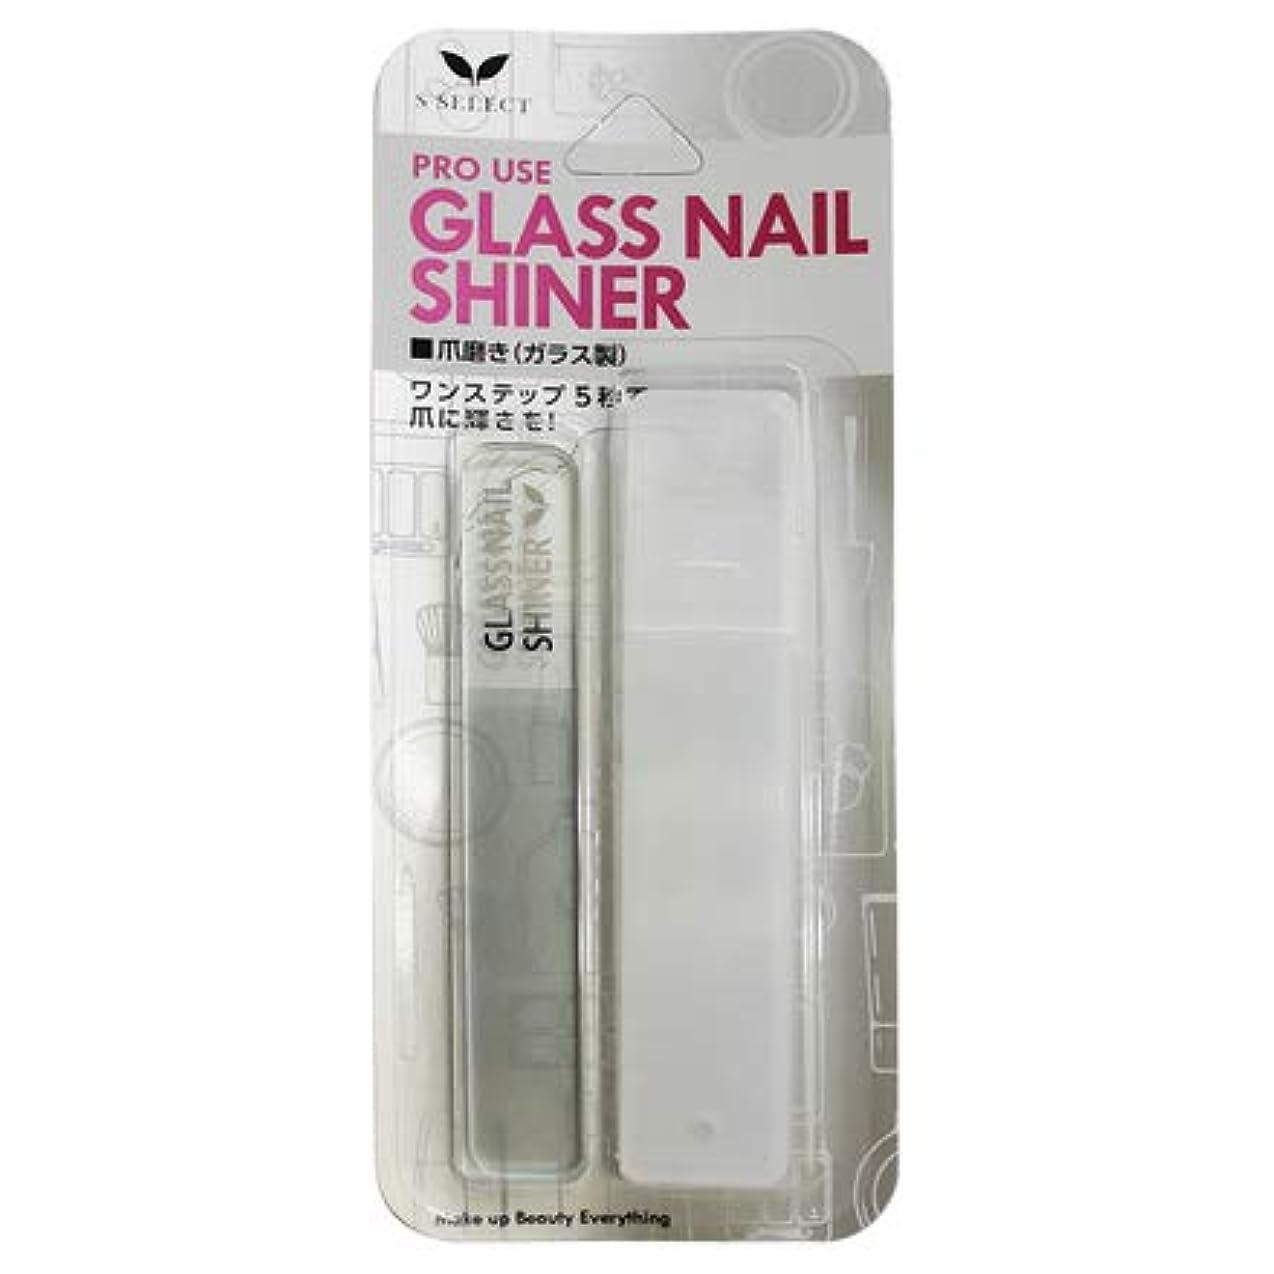 S SELECT エスセレクト PRO USE GLASS NAIL SHINER グラスネイルシャイナー 爪磨き ガラス製